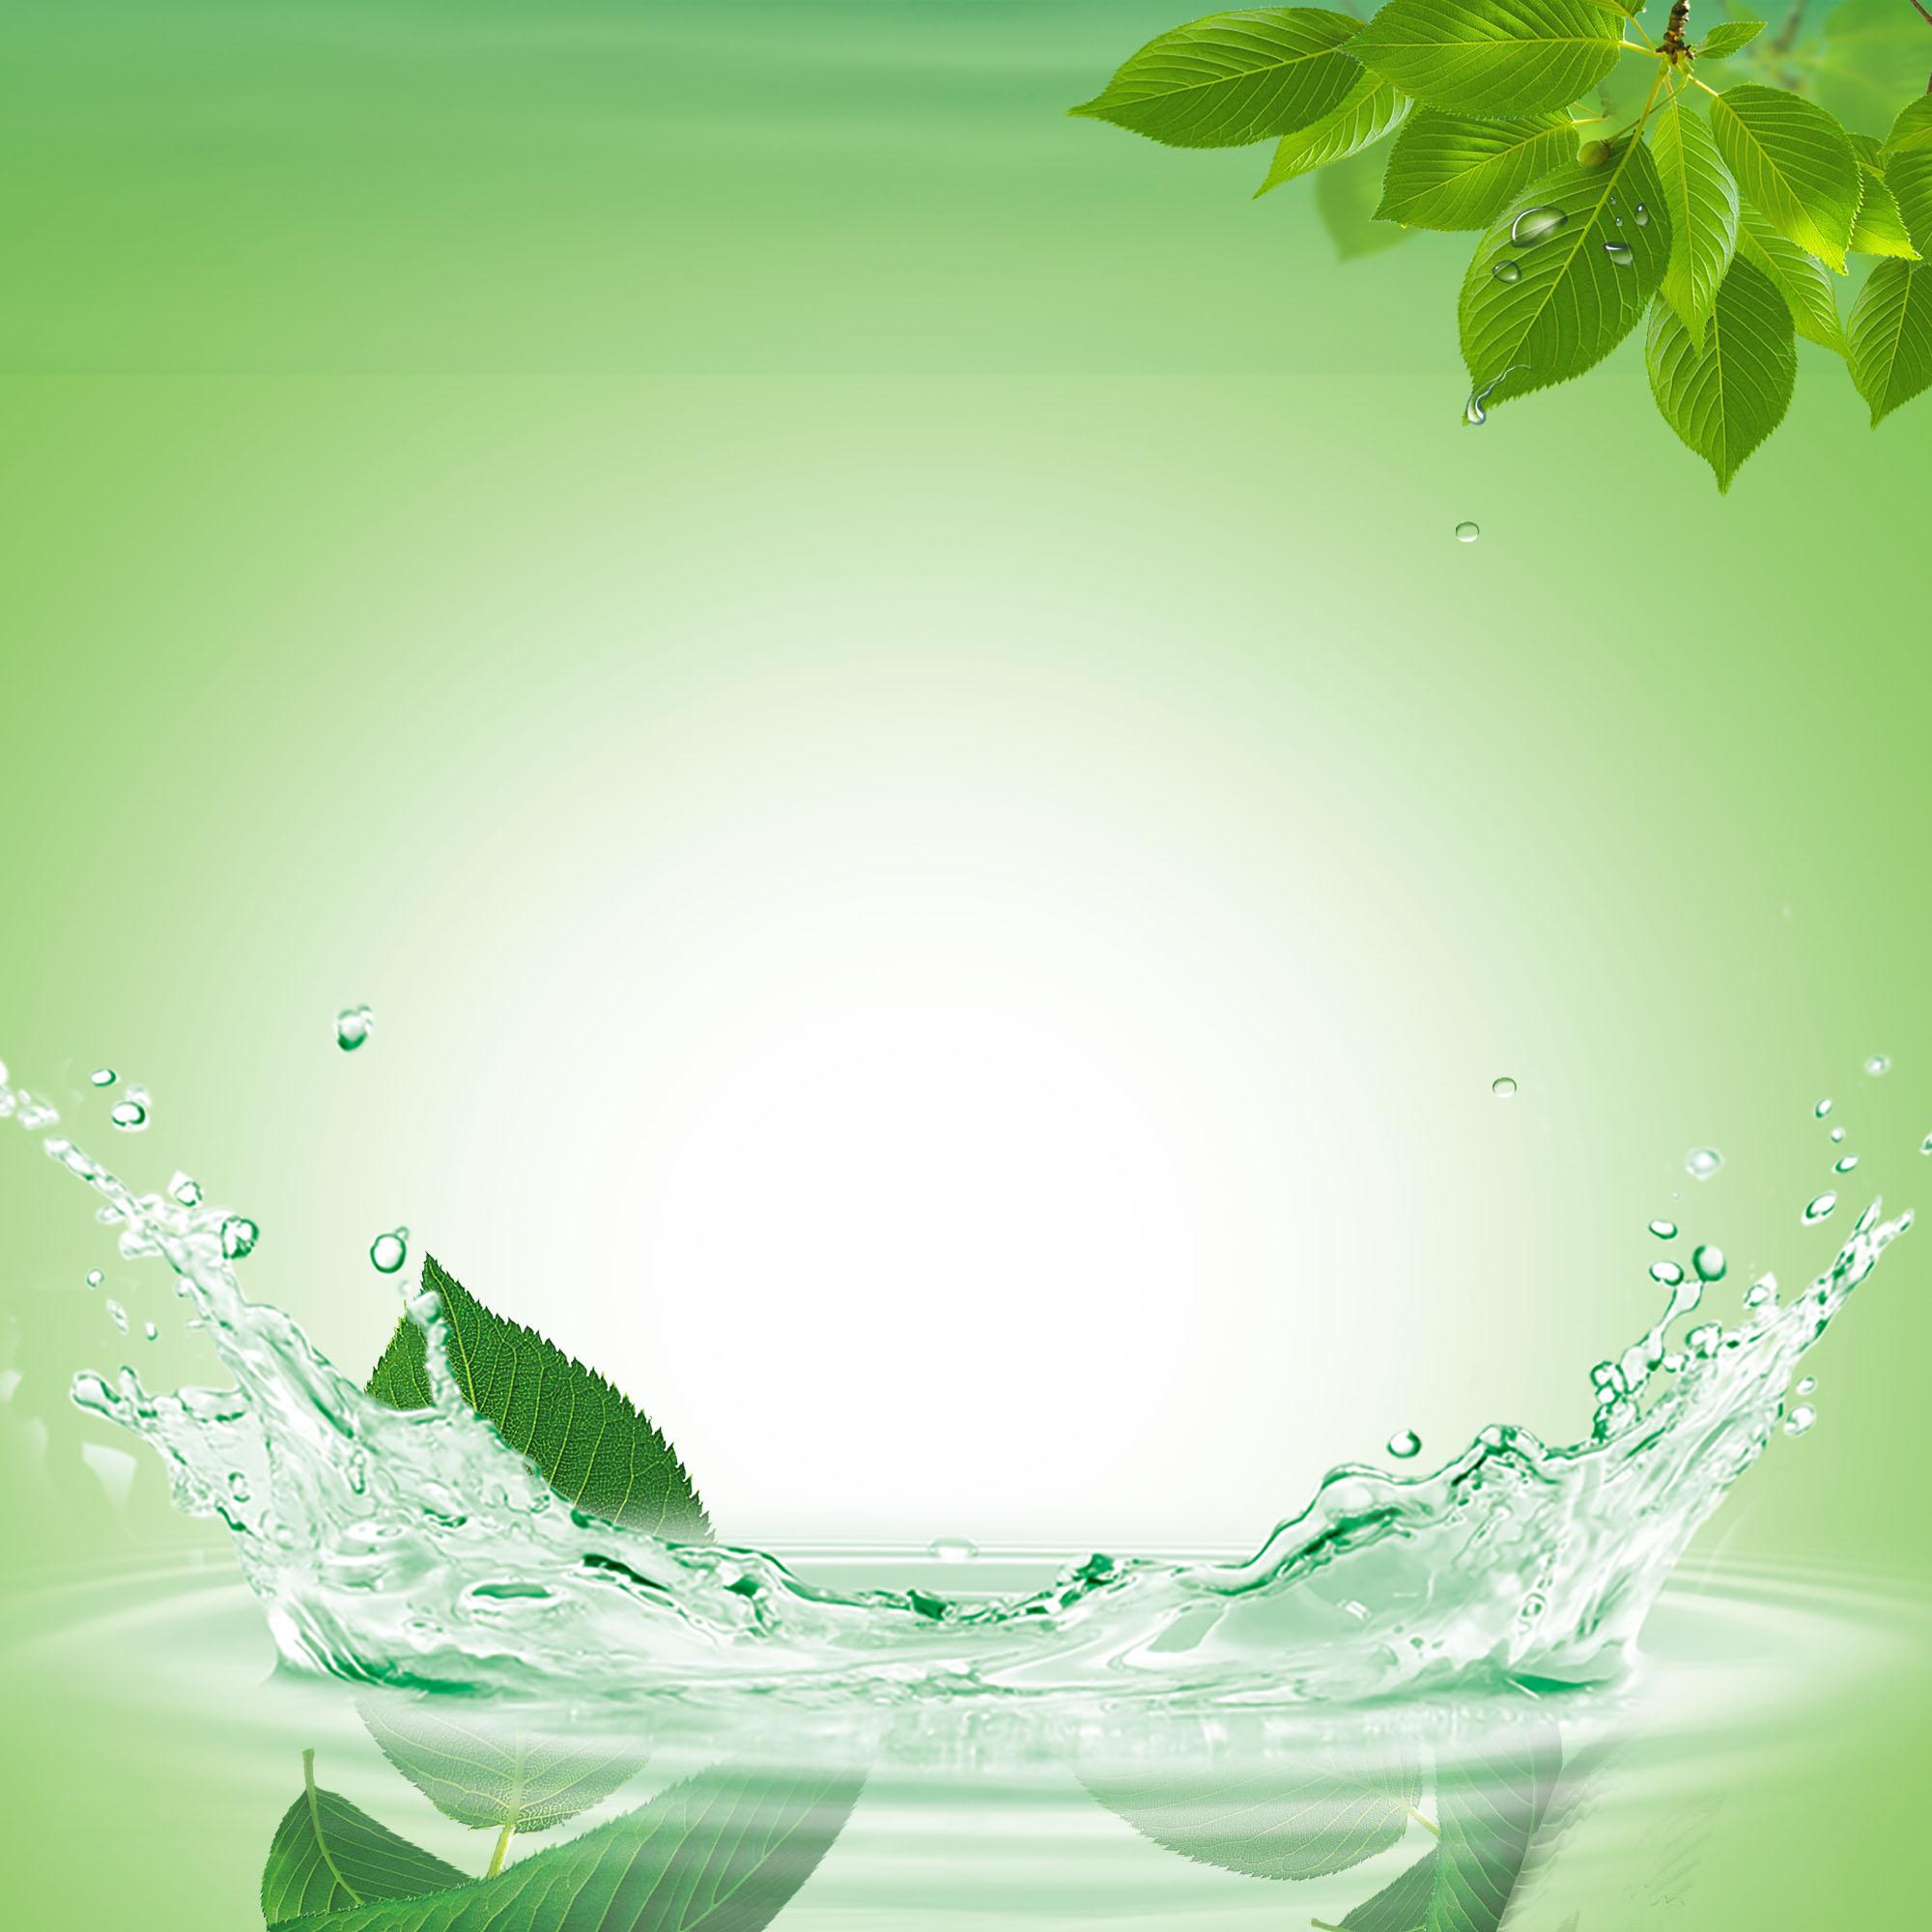 Fresh Water Drops Splash Poster Green Background Green